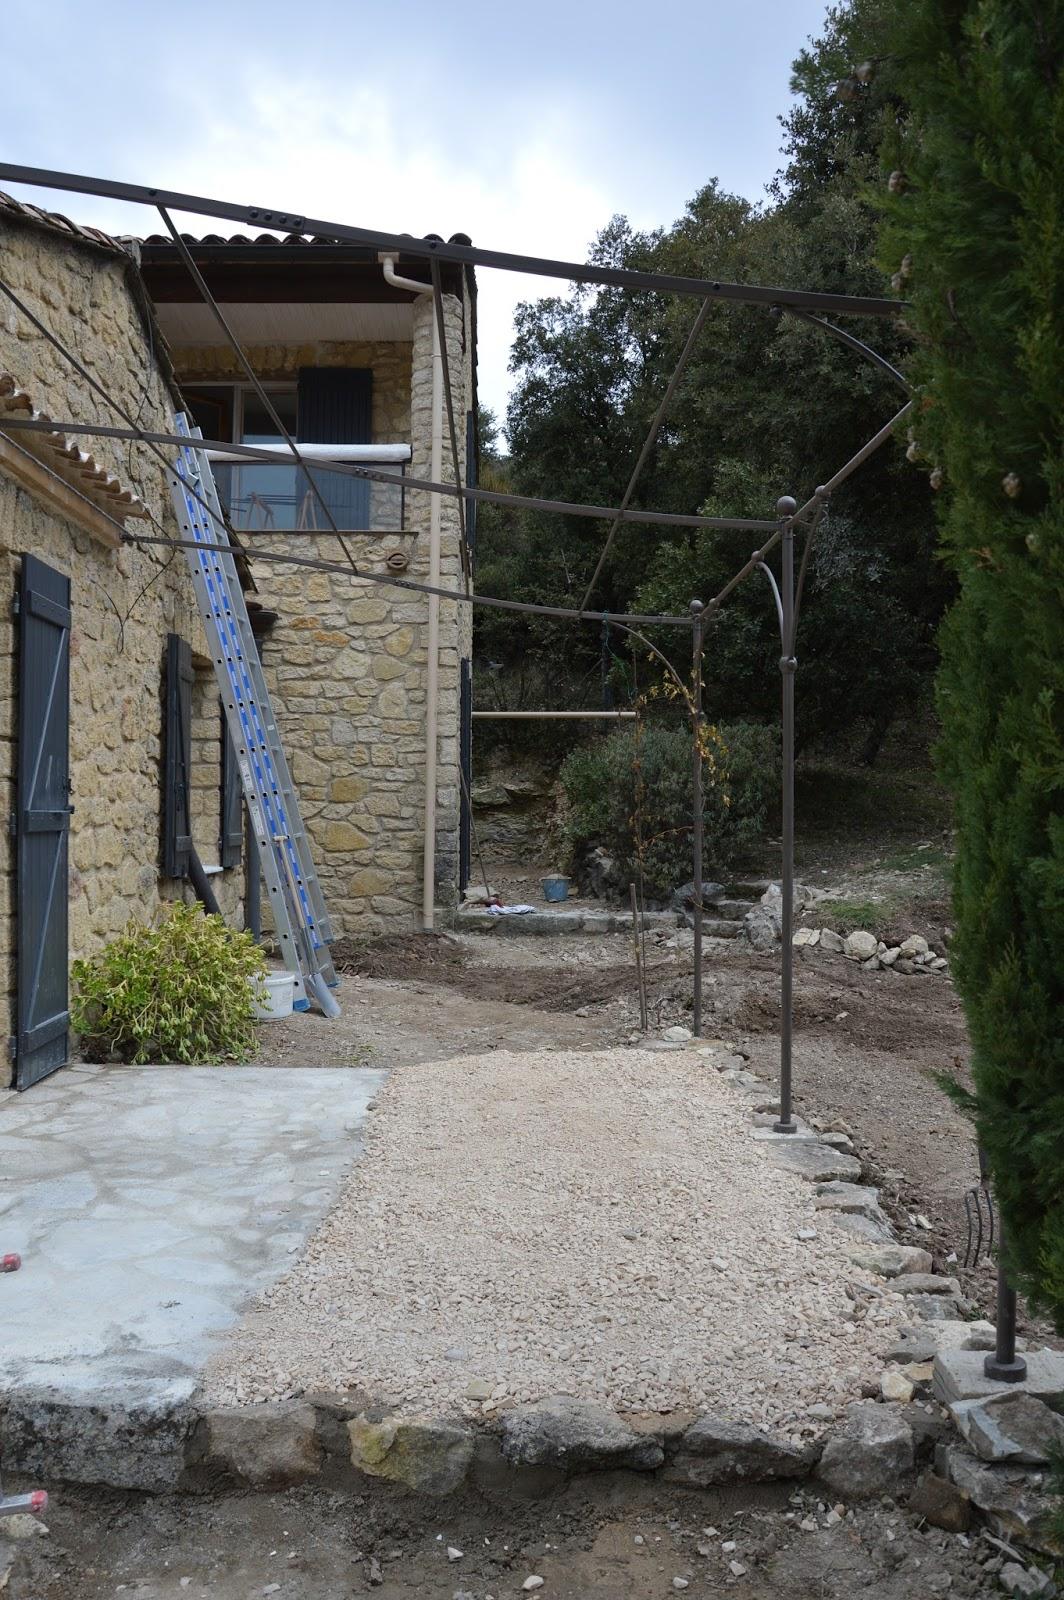 Maison malauc ne renoveren parkings terrassen - Provencaalse terras ...